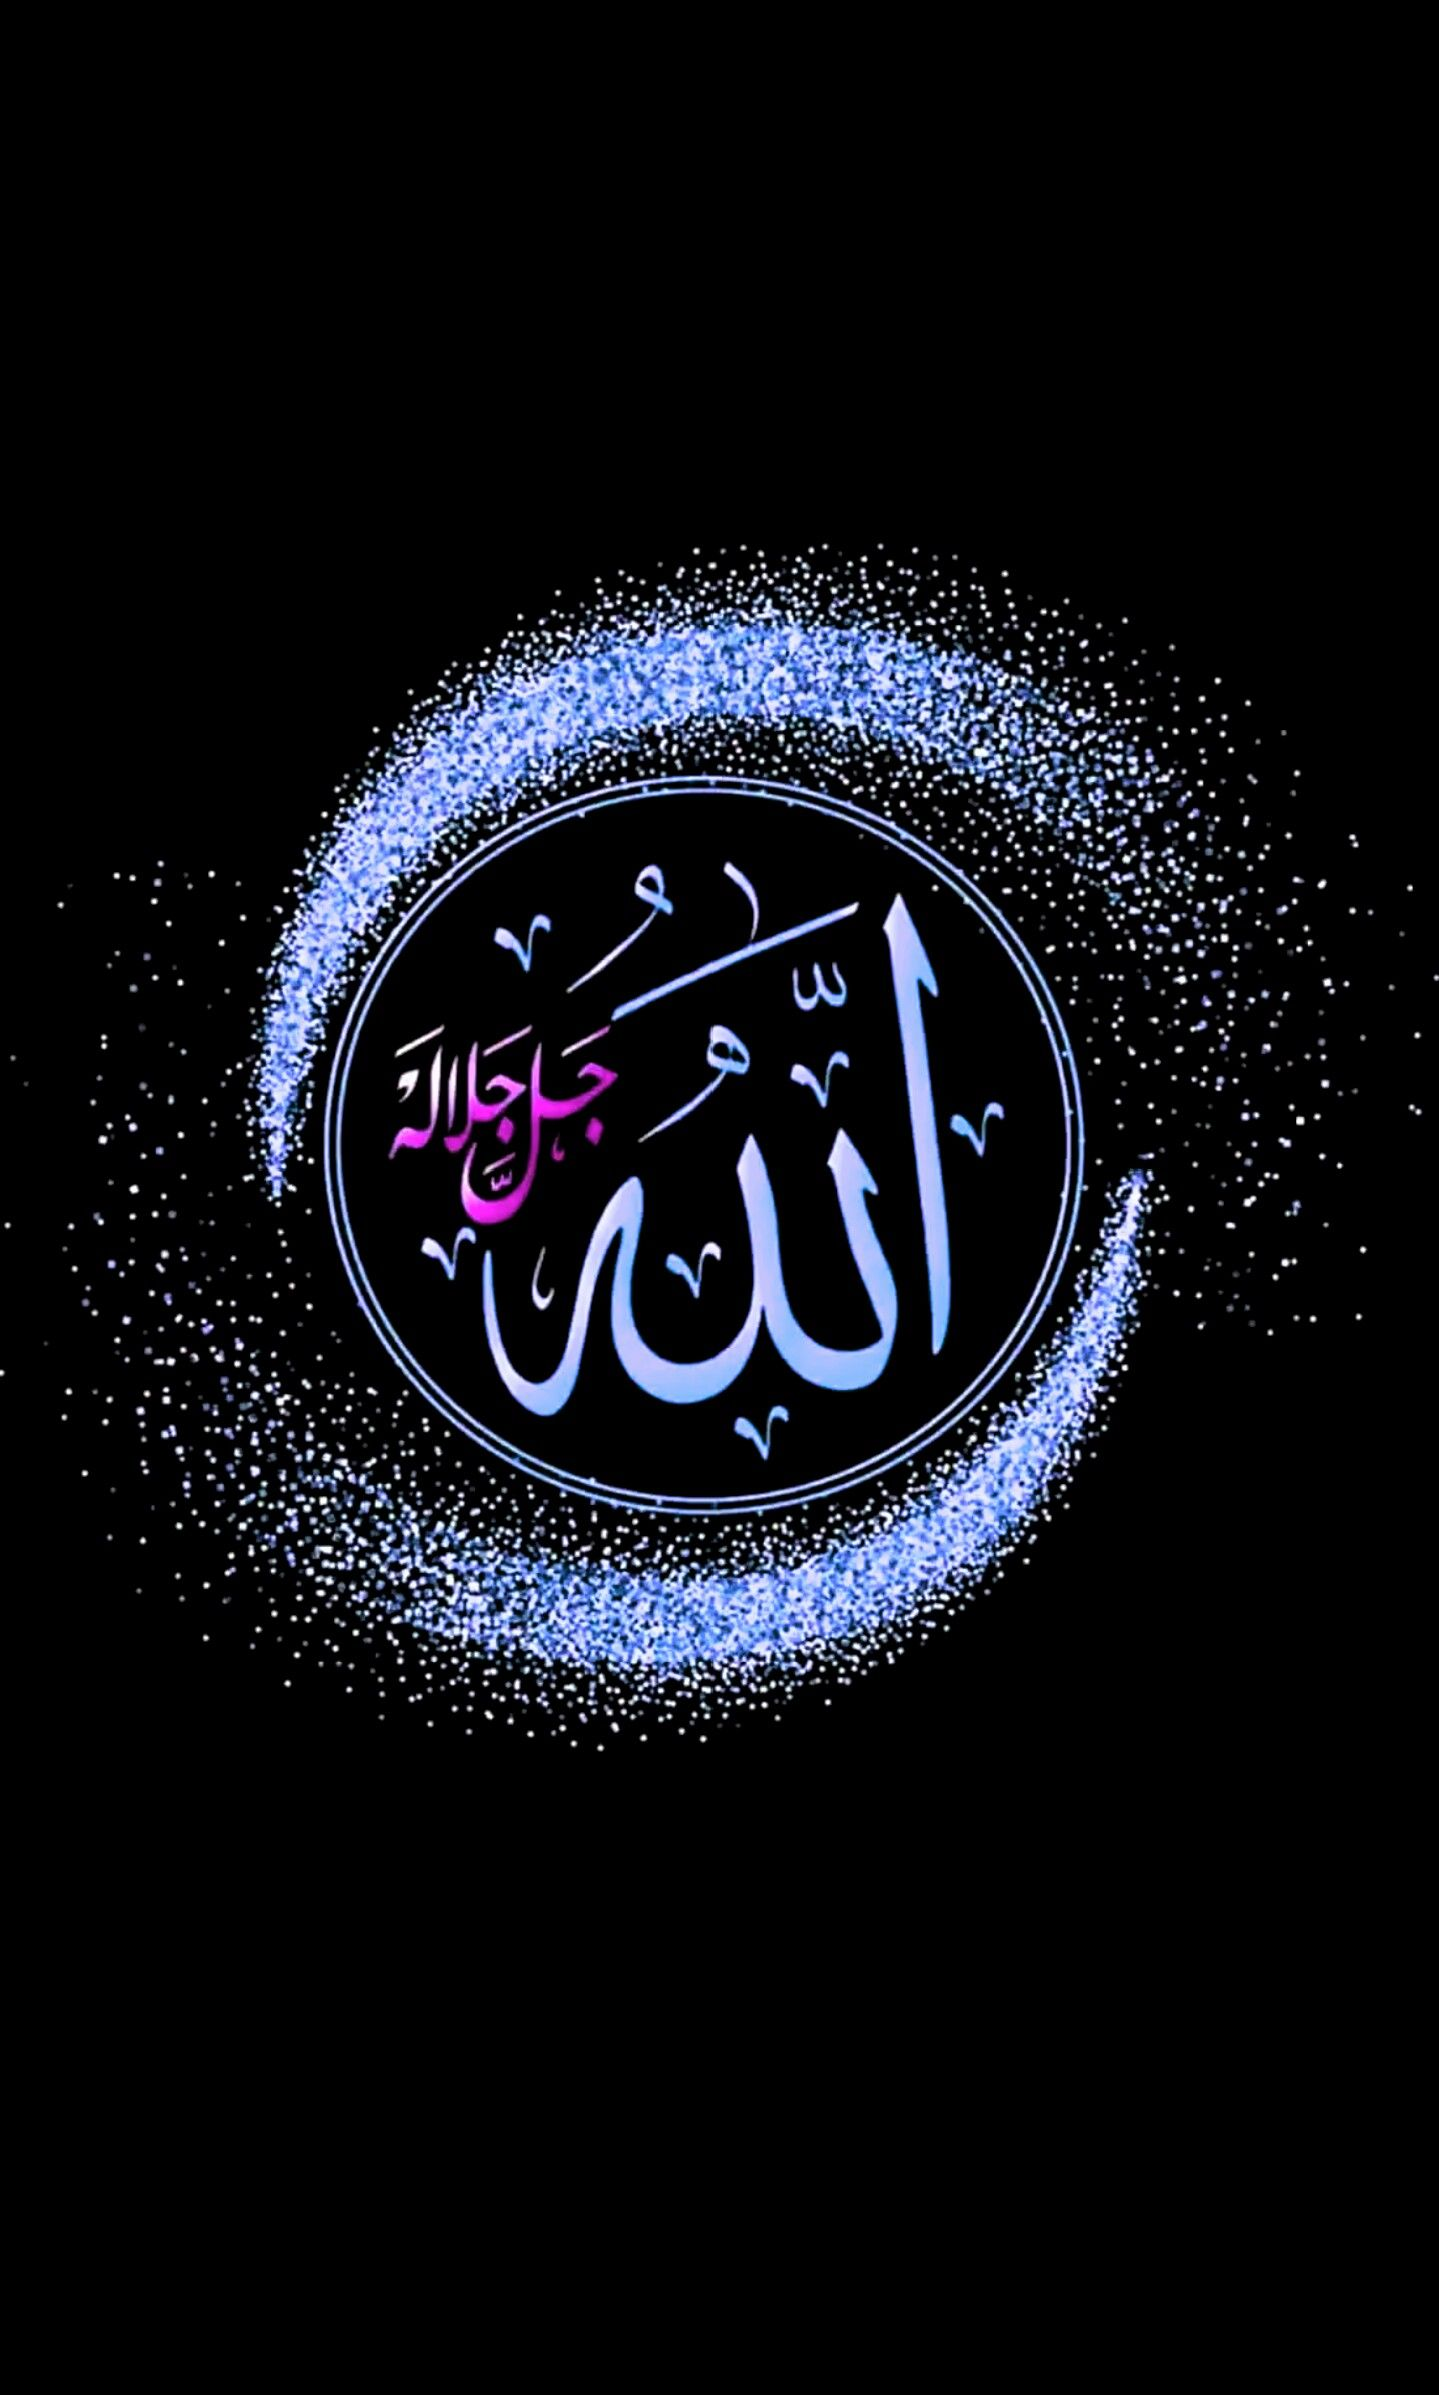 Pin Oleh Sgaas Sgaas Di Kiymetli Sozler Lukisan Huruf Seni Kaligrafi Kaligrafi Islam